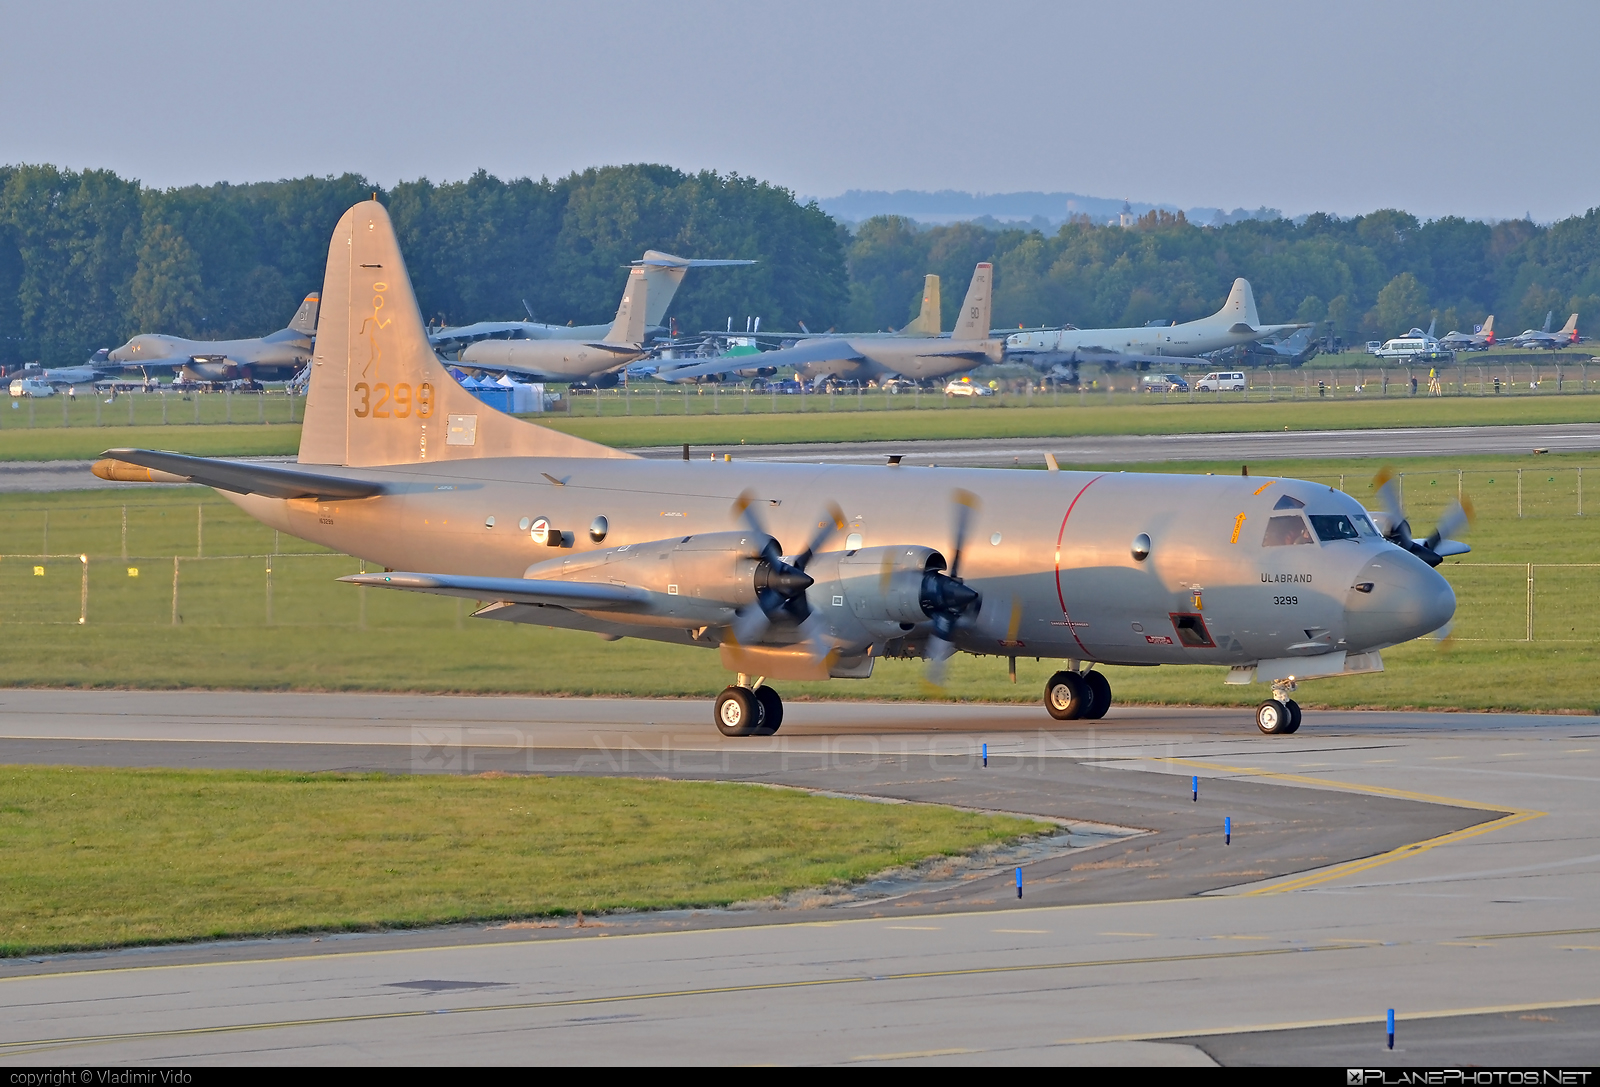 Lockheed P-3C Orion - 3299 operated by Luftforsvaret (Royal Norwegian Air Force) #lockheed #lockheedorion #lockheedp3 #natodays2016 #p3cOrion #p3orion #rnoaf #royalnorwegianairforce